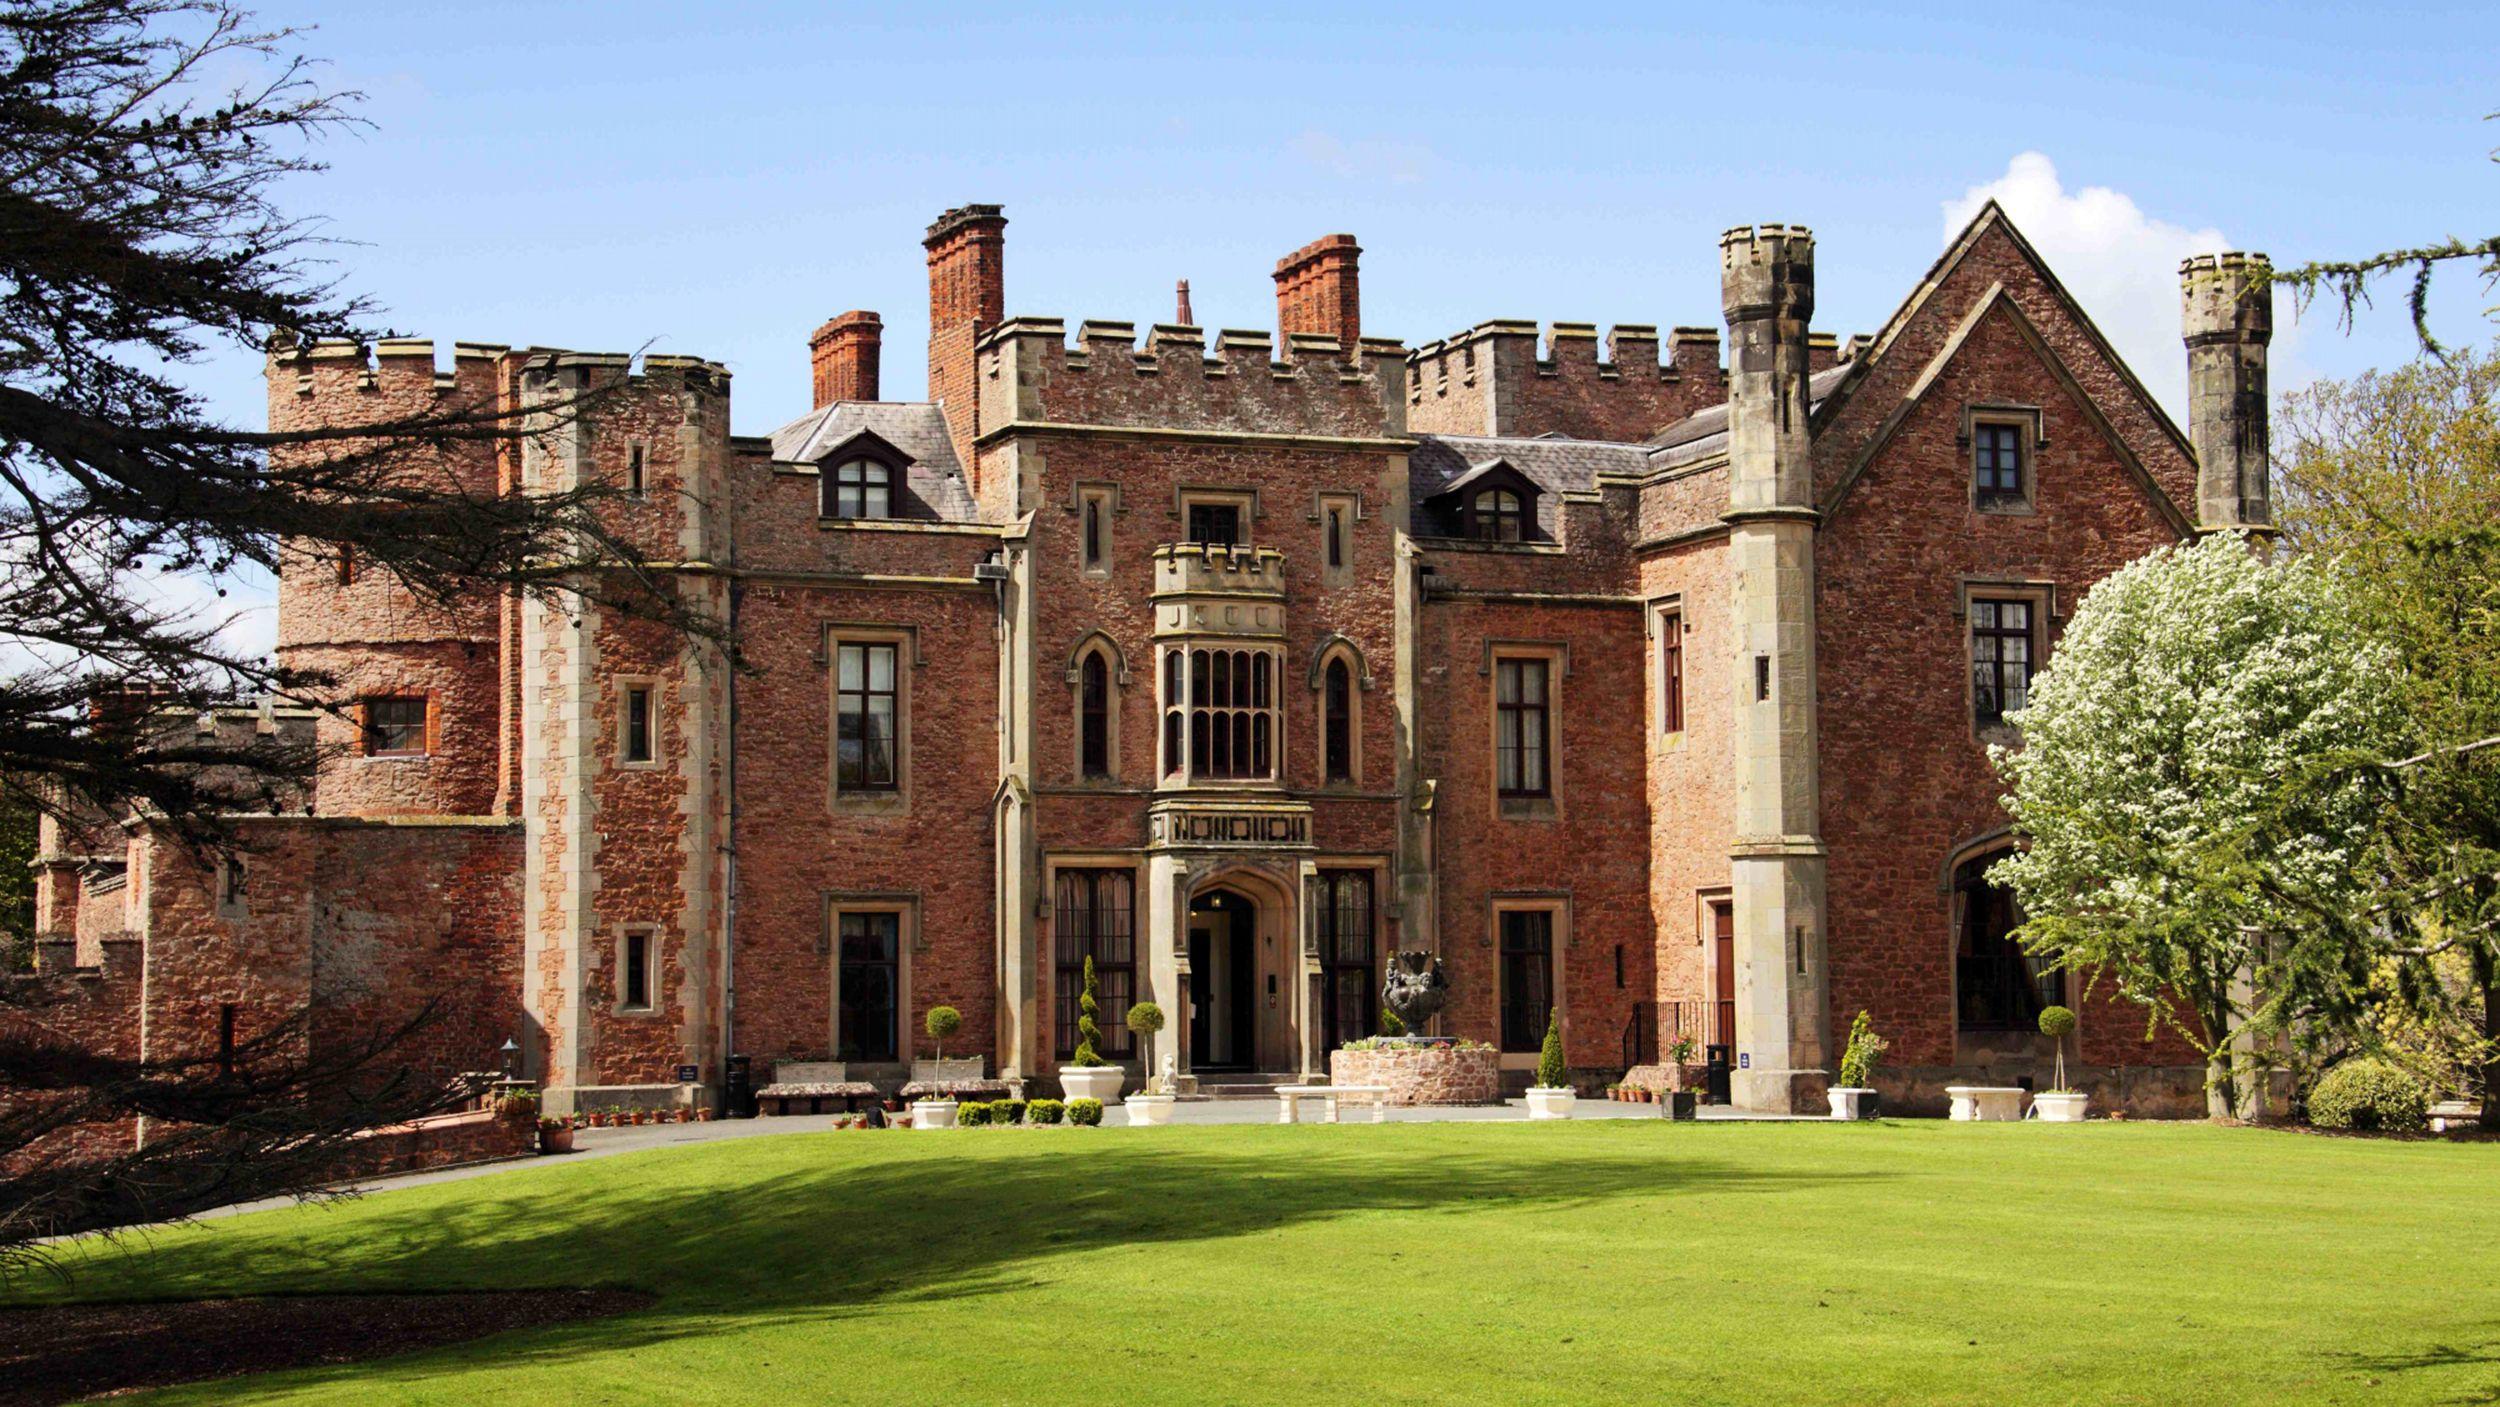 Scotland's Fonab Castle Hotel tops TripAdvisor list of the 10 best castle hotels in the world.